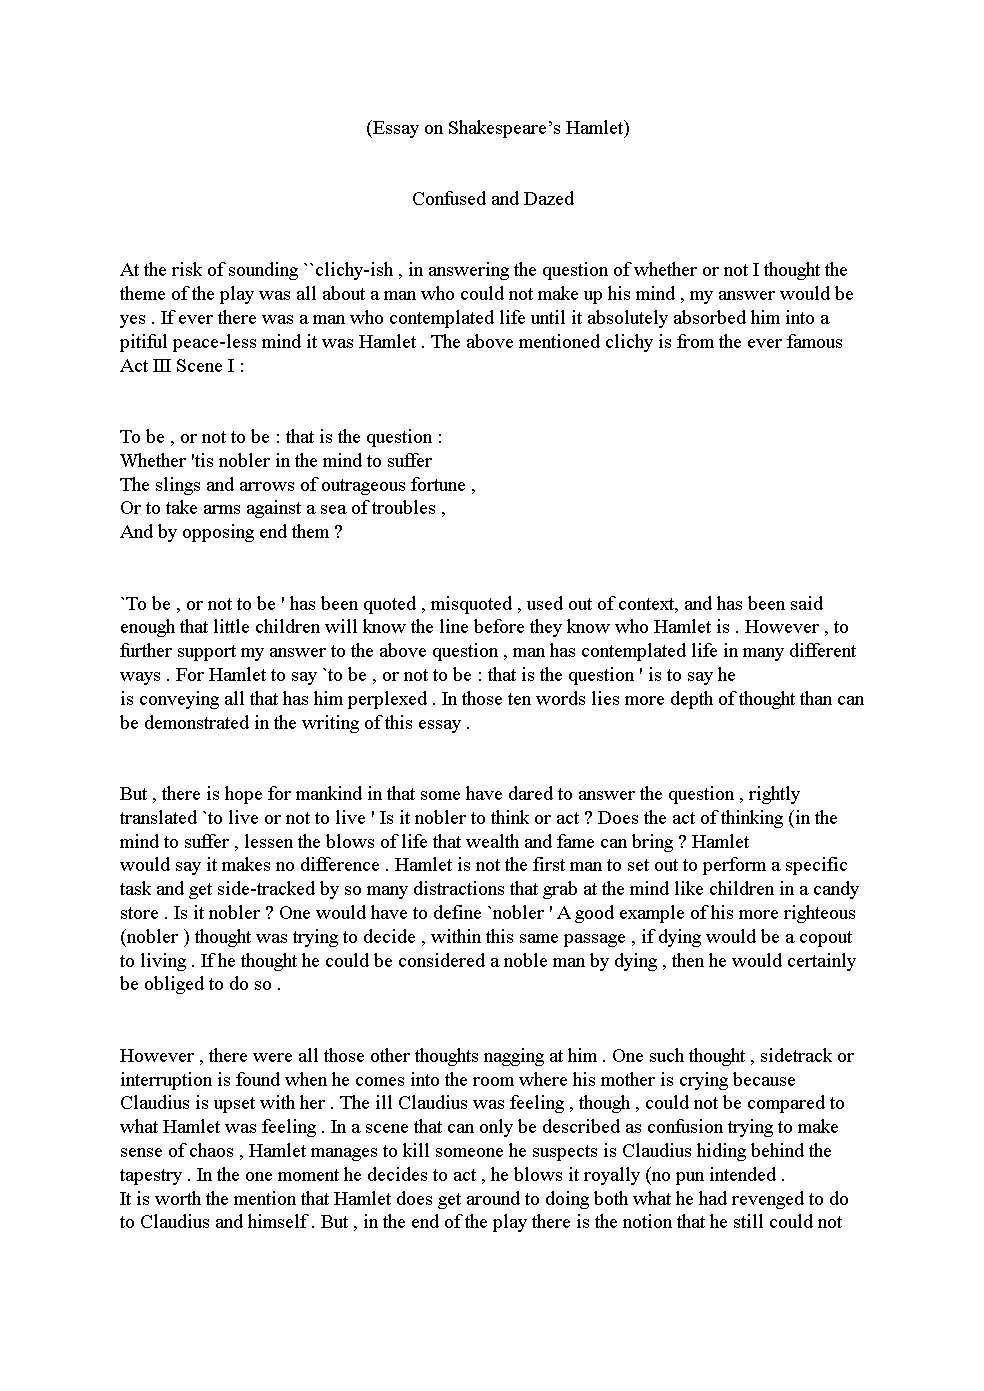 007 Drama Essay Sample Childhood Memory Top Ideas Earliest My Memories Example Full